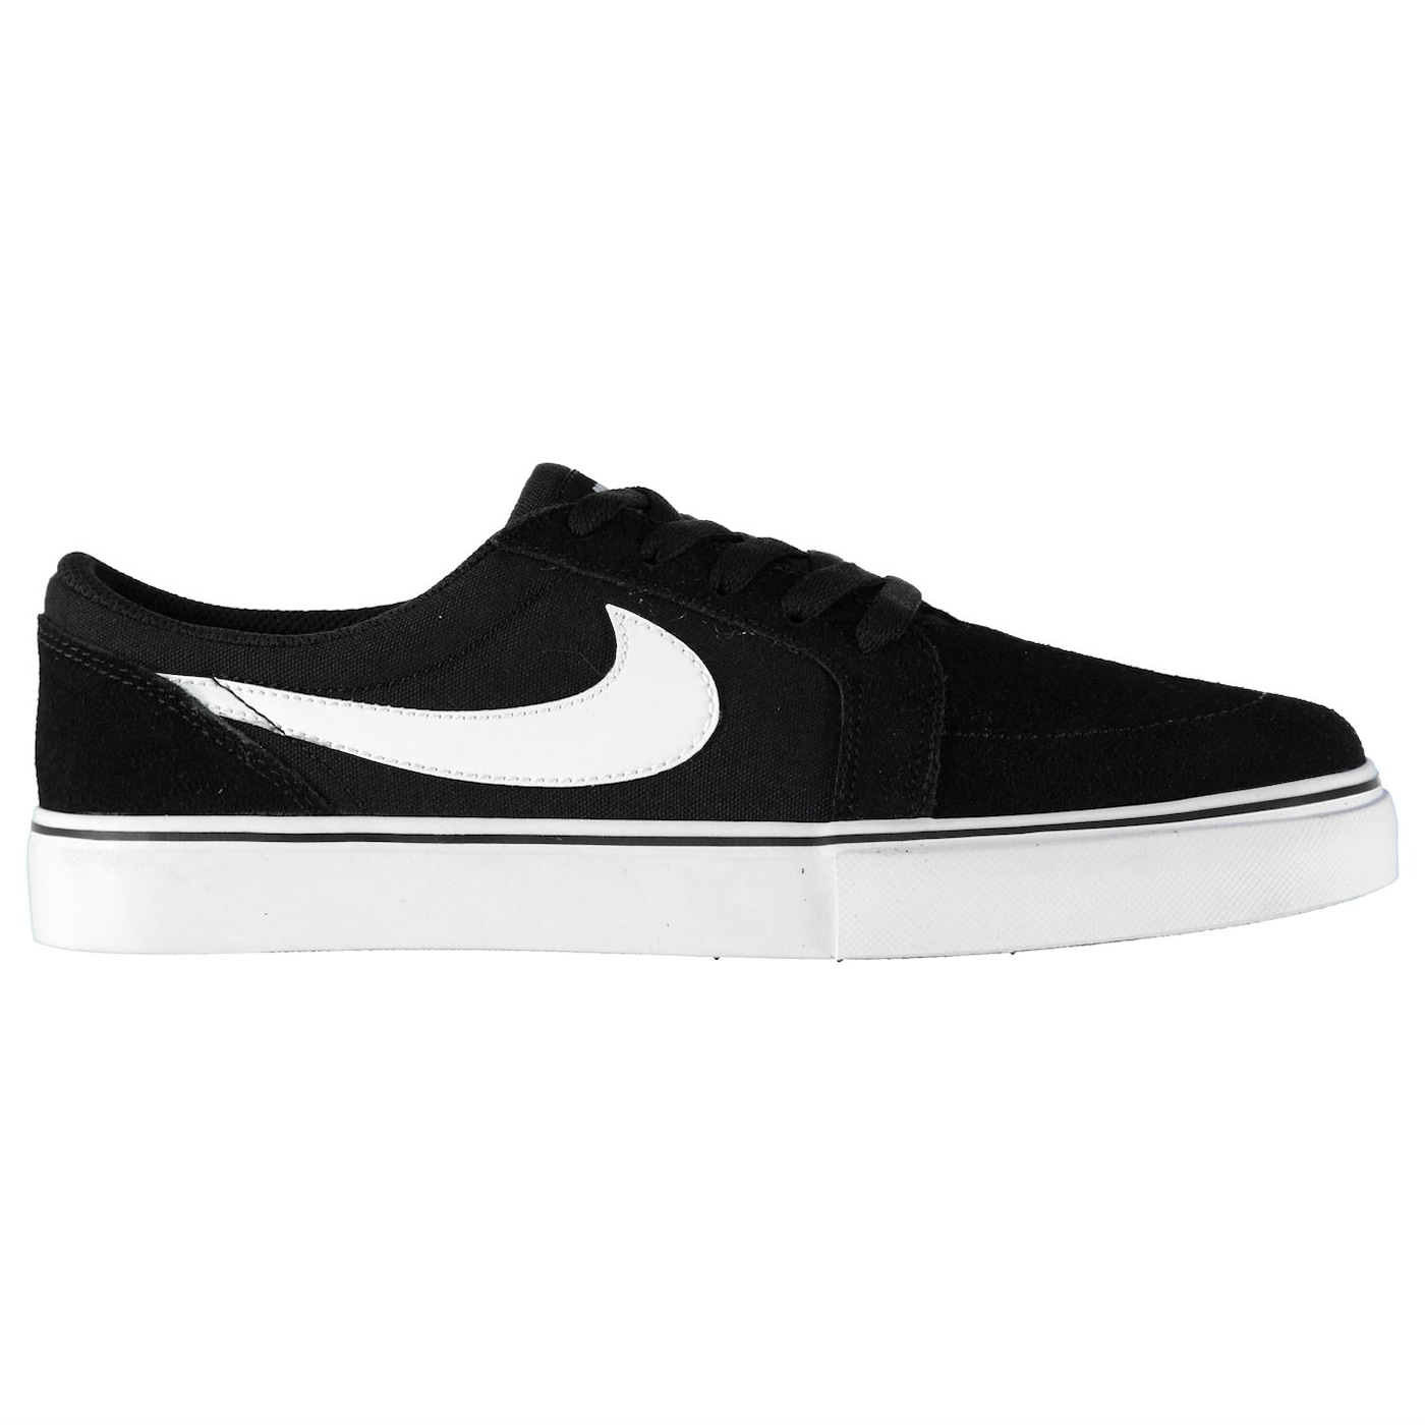 Nike SB Satire II Mens Skate Shoes